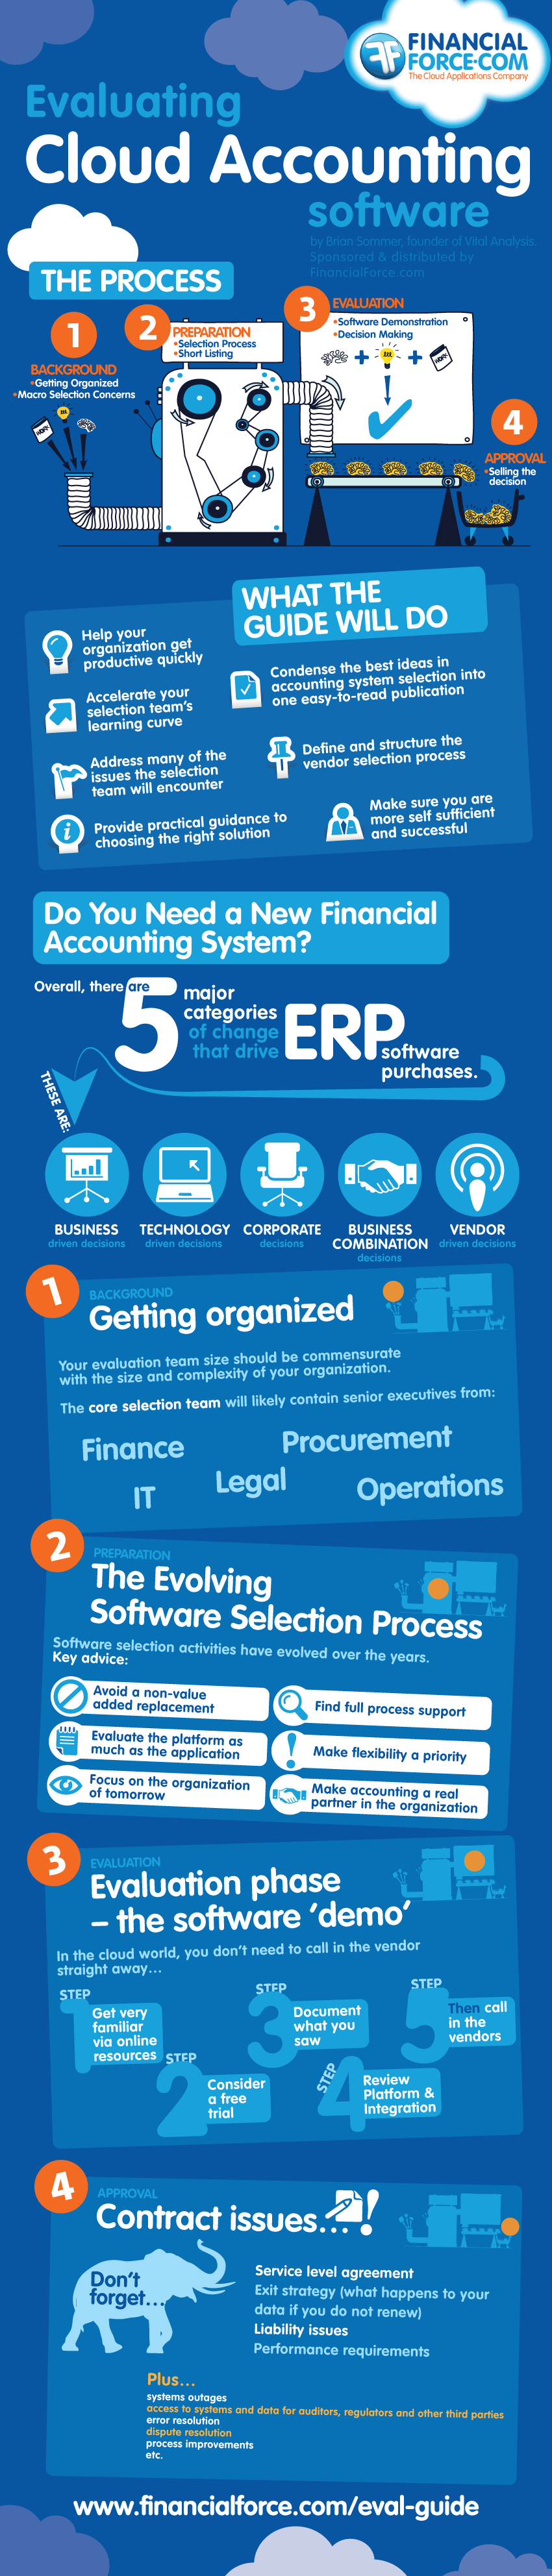 ERP Cloud Computing Services